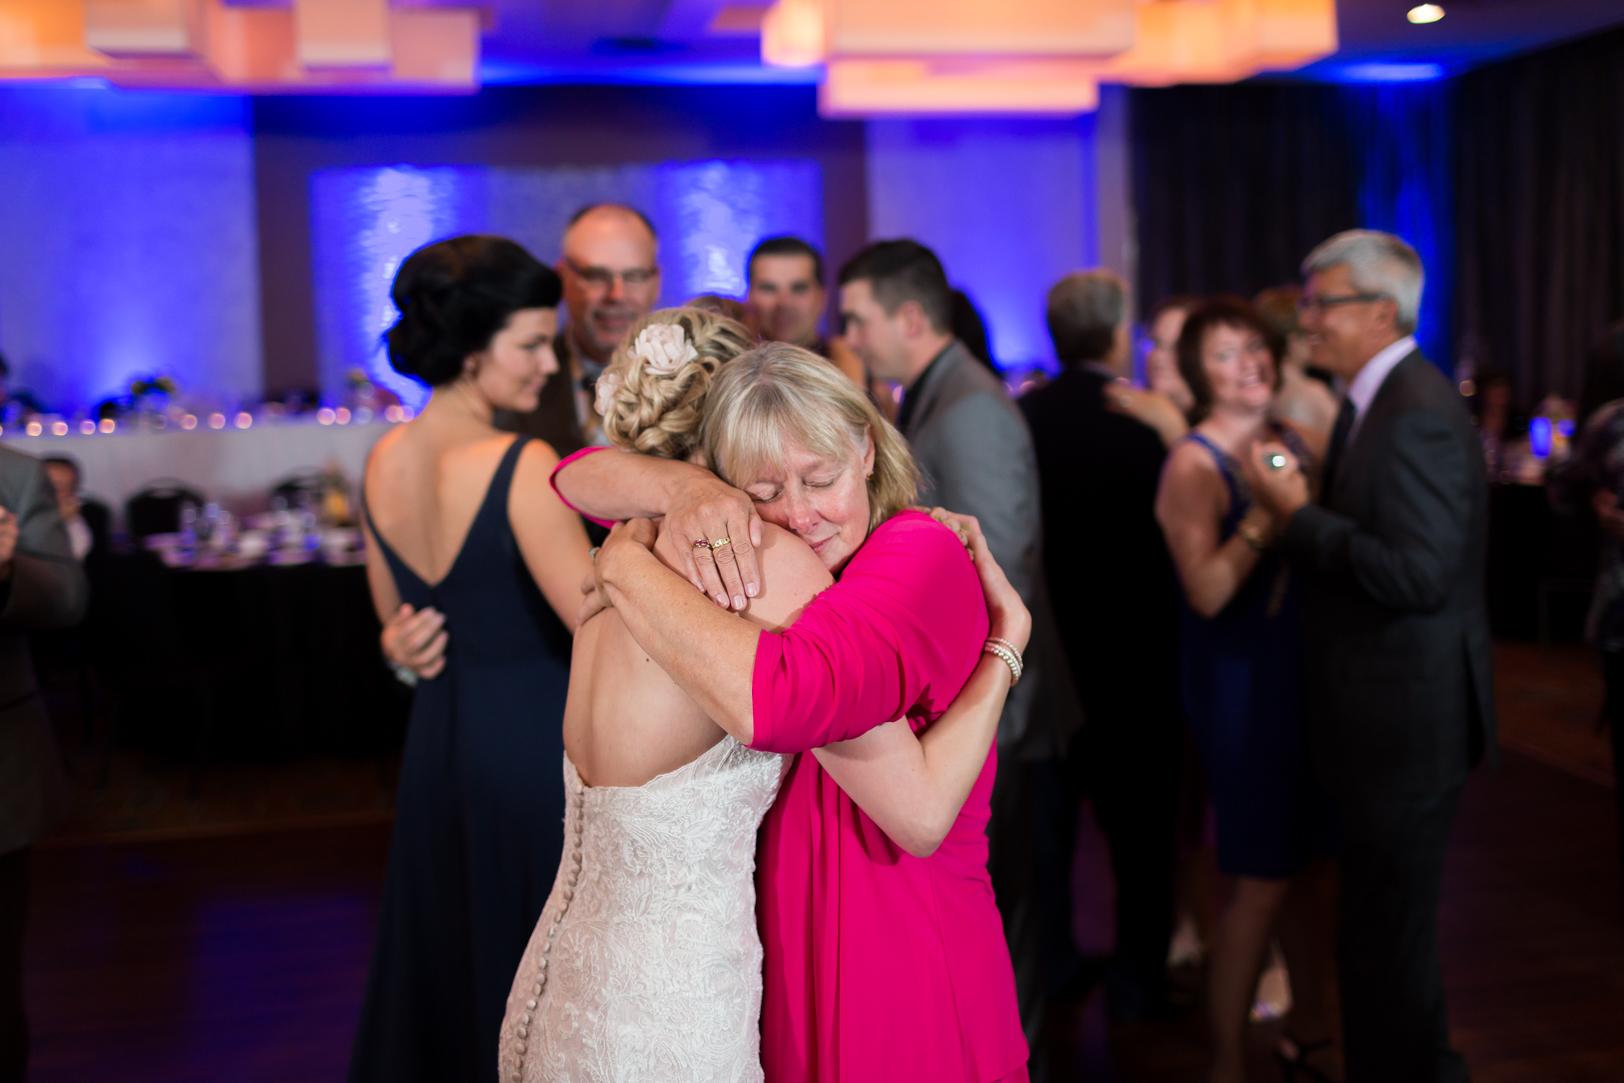 emotional wedding reception photos